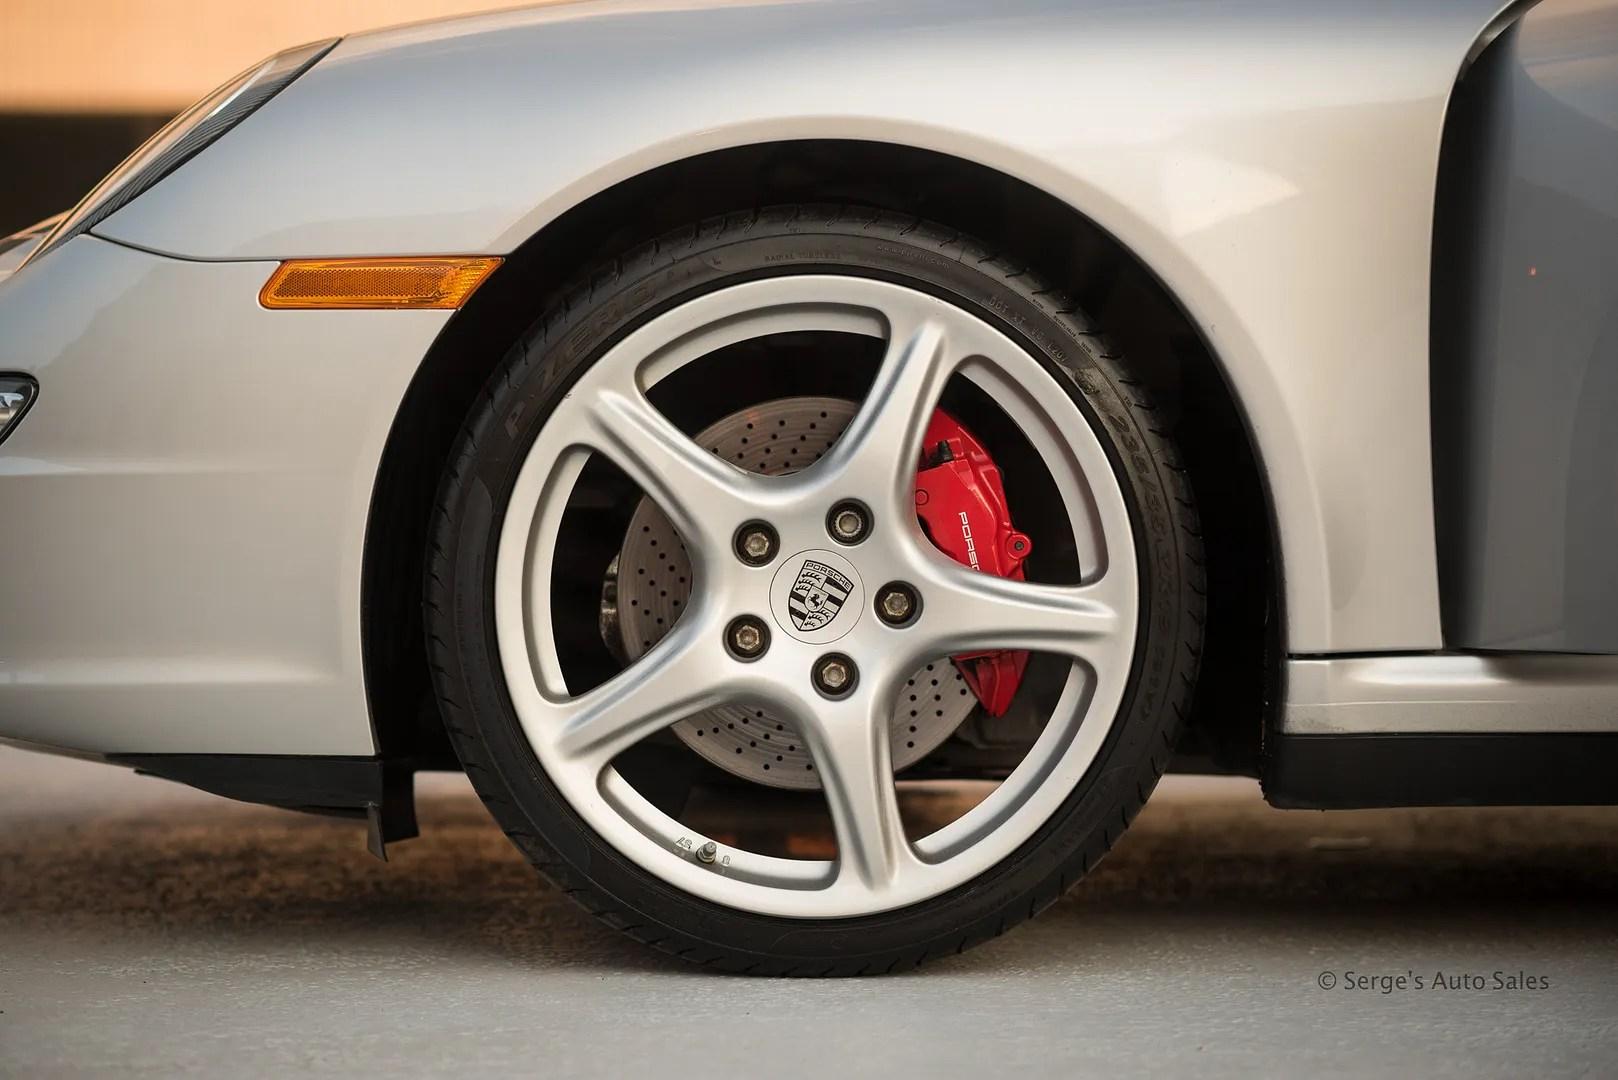 photo Serges-auto-sales-porsche-911-for-sale-scranton-pennsylvania-46_zpshvt9fmqd.jpg